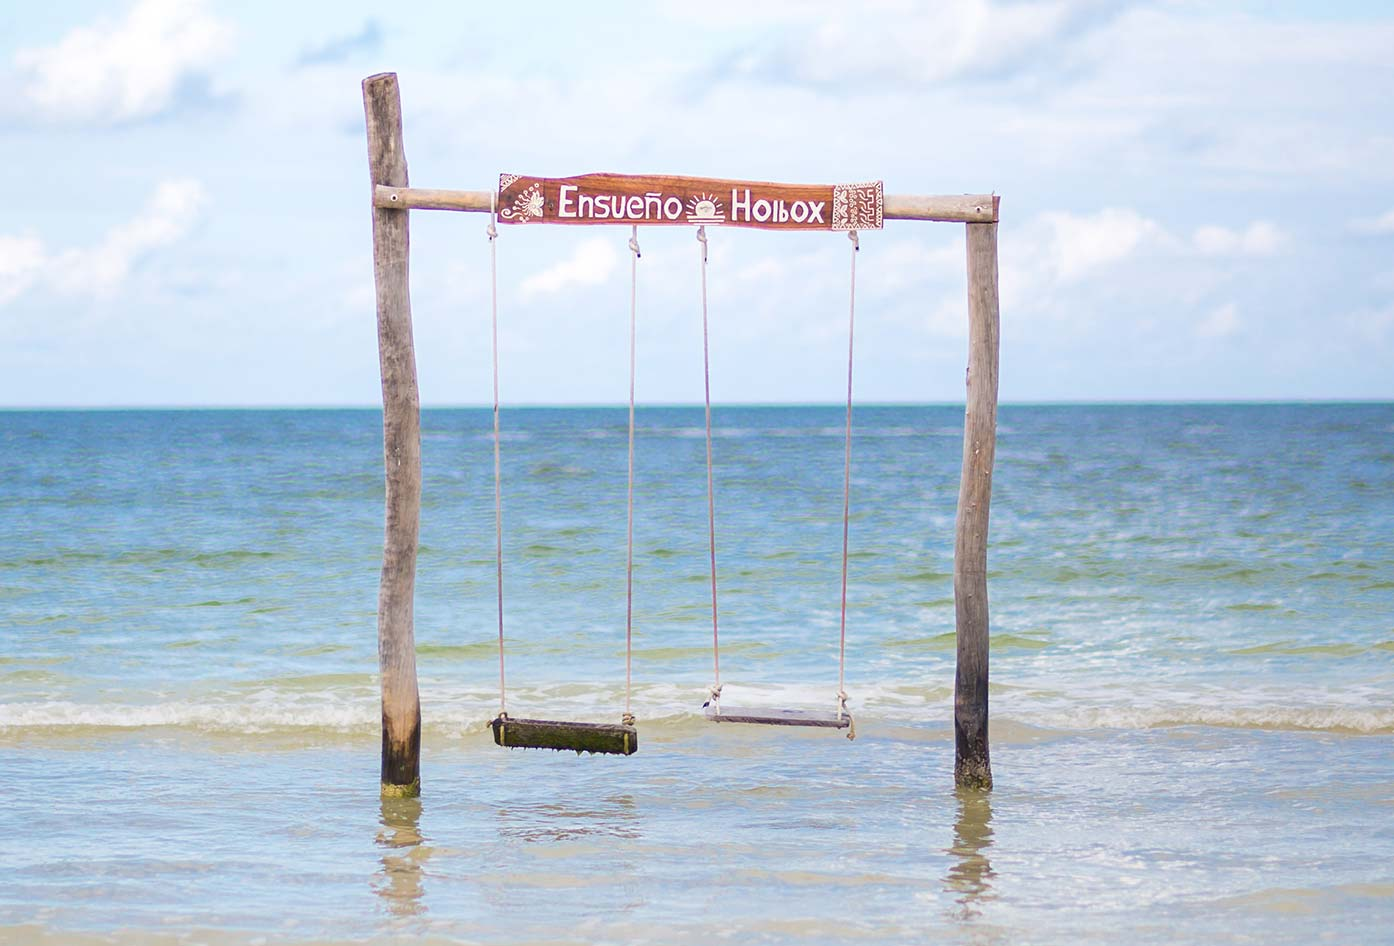 isla holbox riviera maya